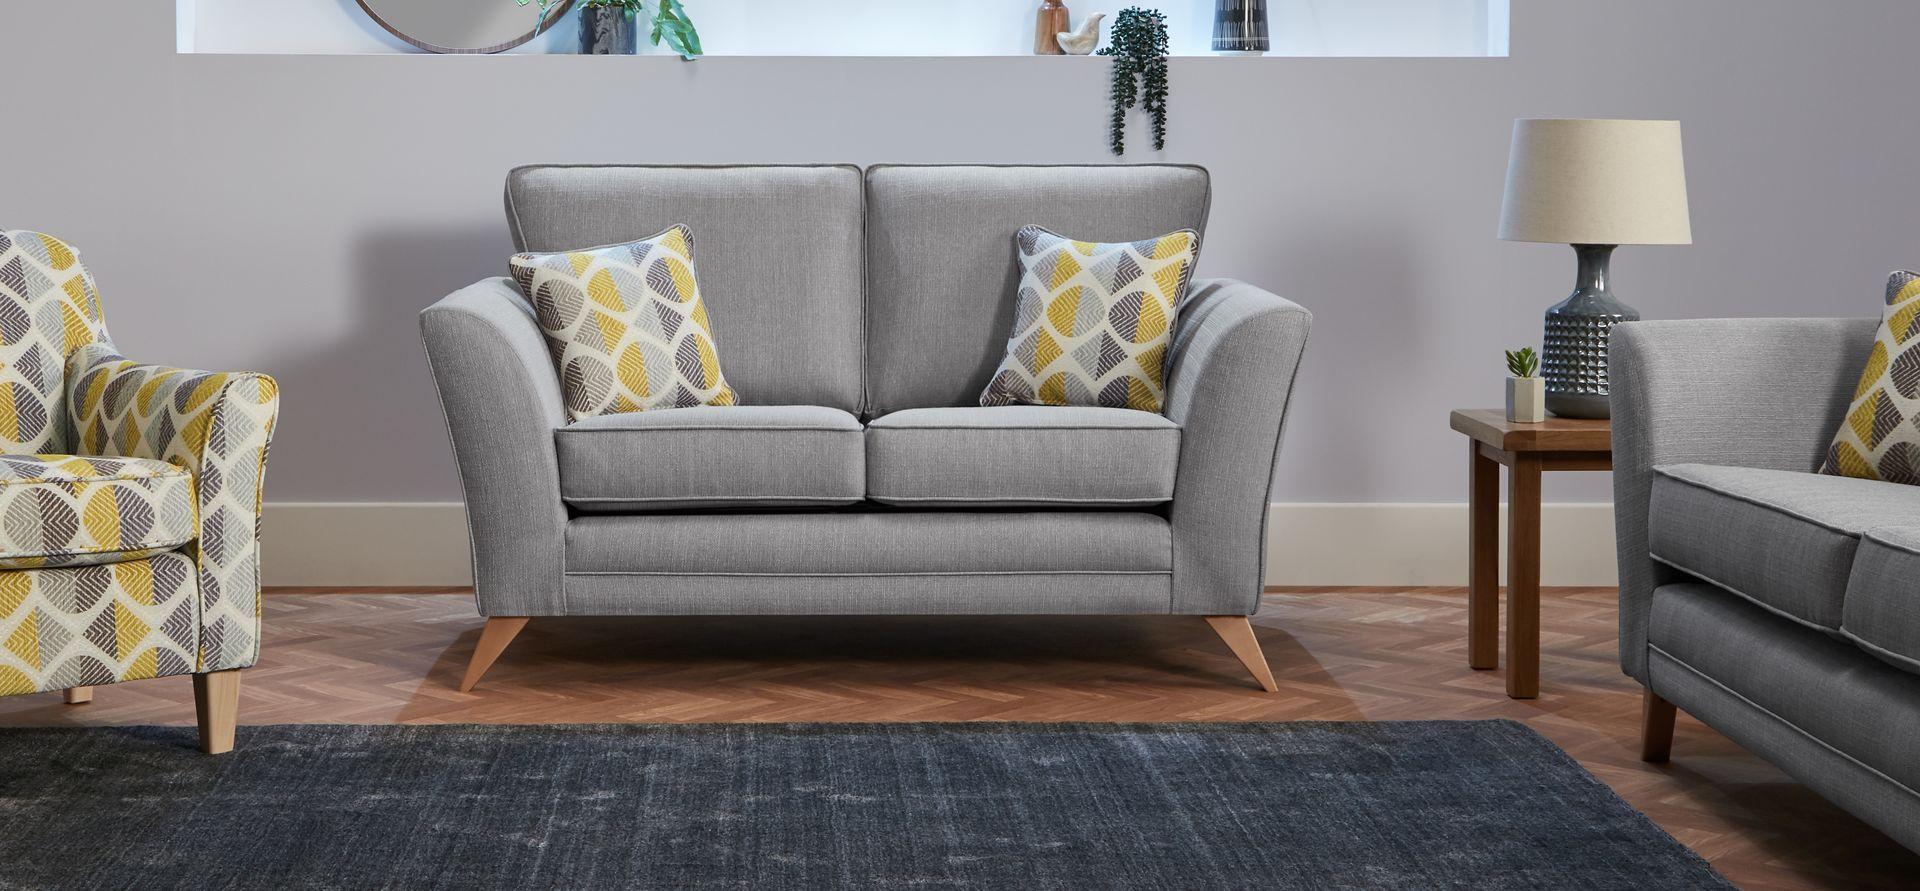 Helios 2 Seater Sofa Standard Back Scs Sofa Corner Sofa Fabric Seater Sofa